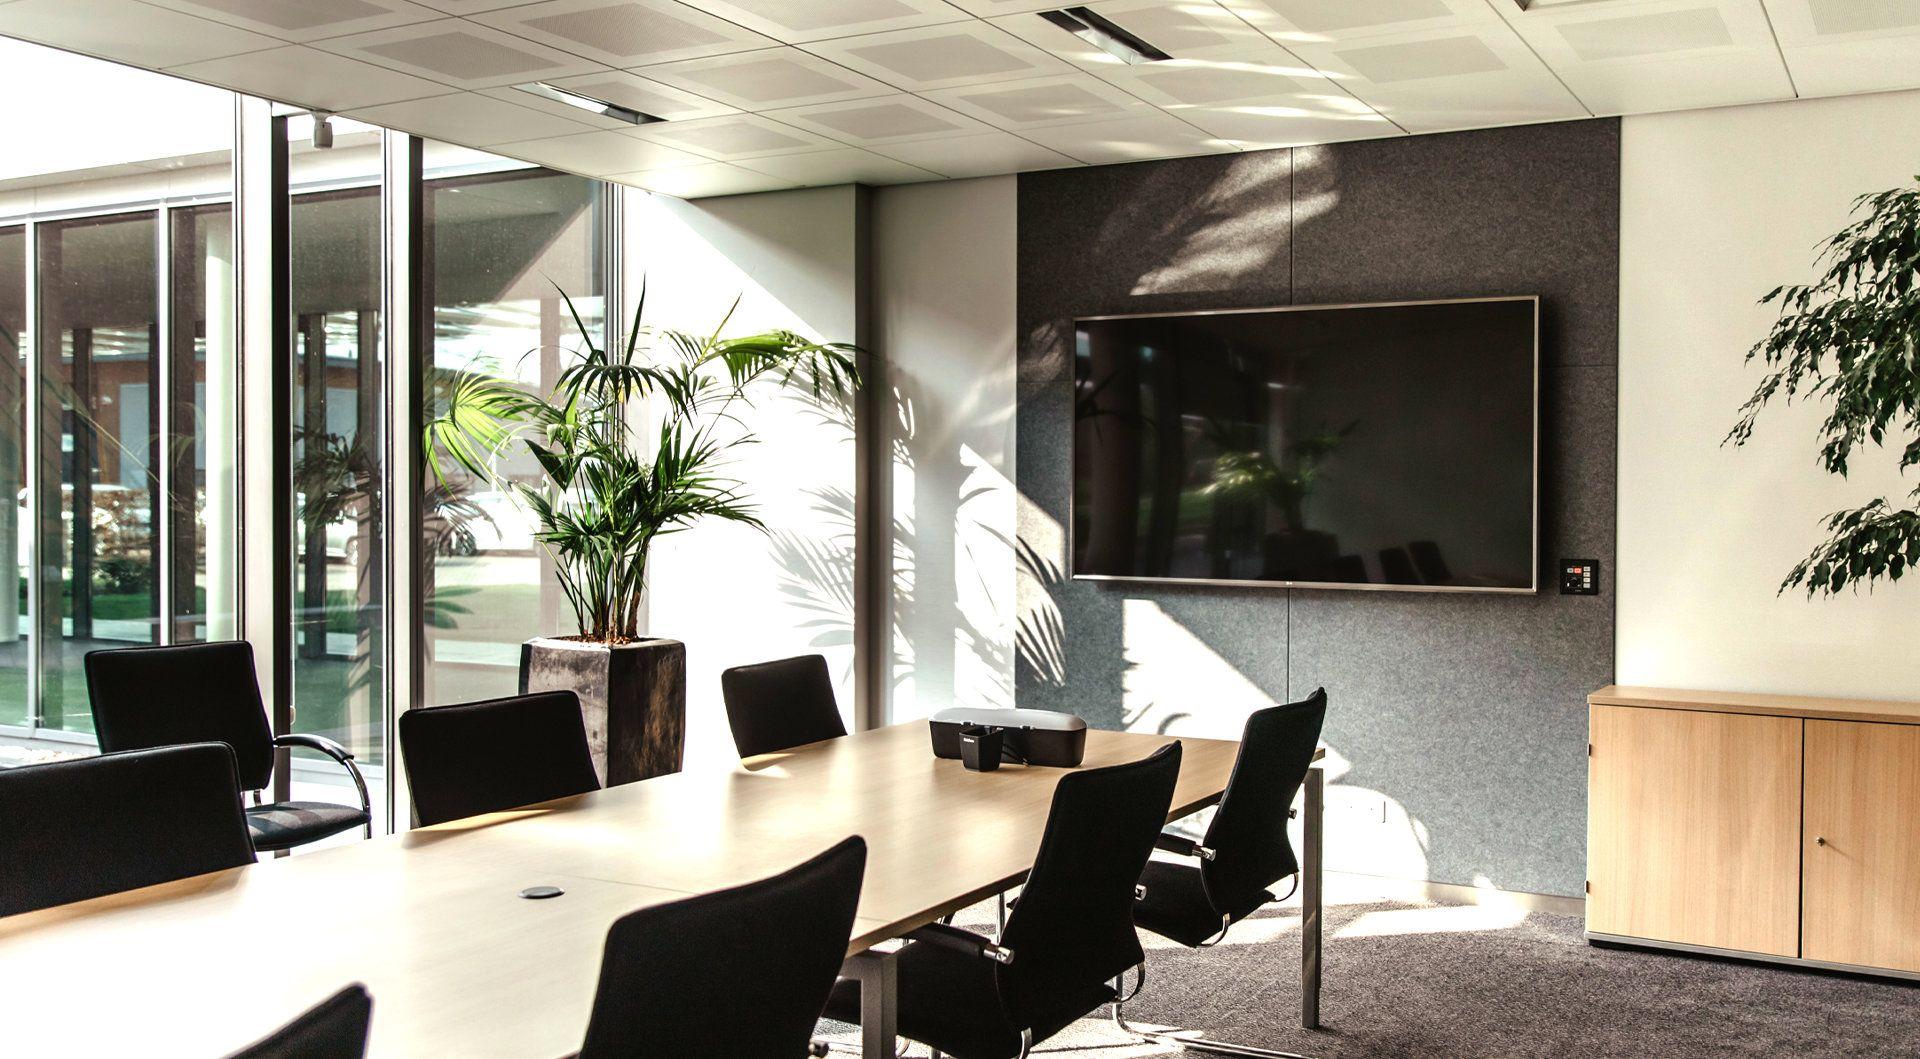 Sony VPL-CH370 beamer/projector Desktopprojector 5000 ANSI lumens 3LCD WUXGA (1920x1200) Wit - Case studie de vries